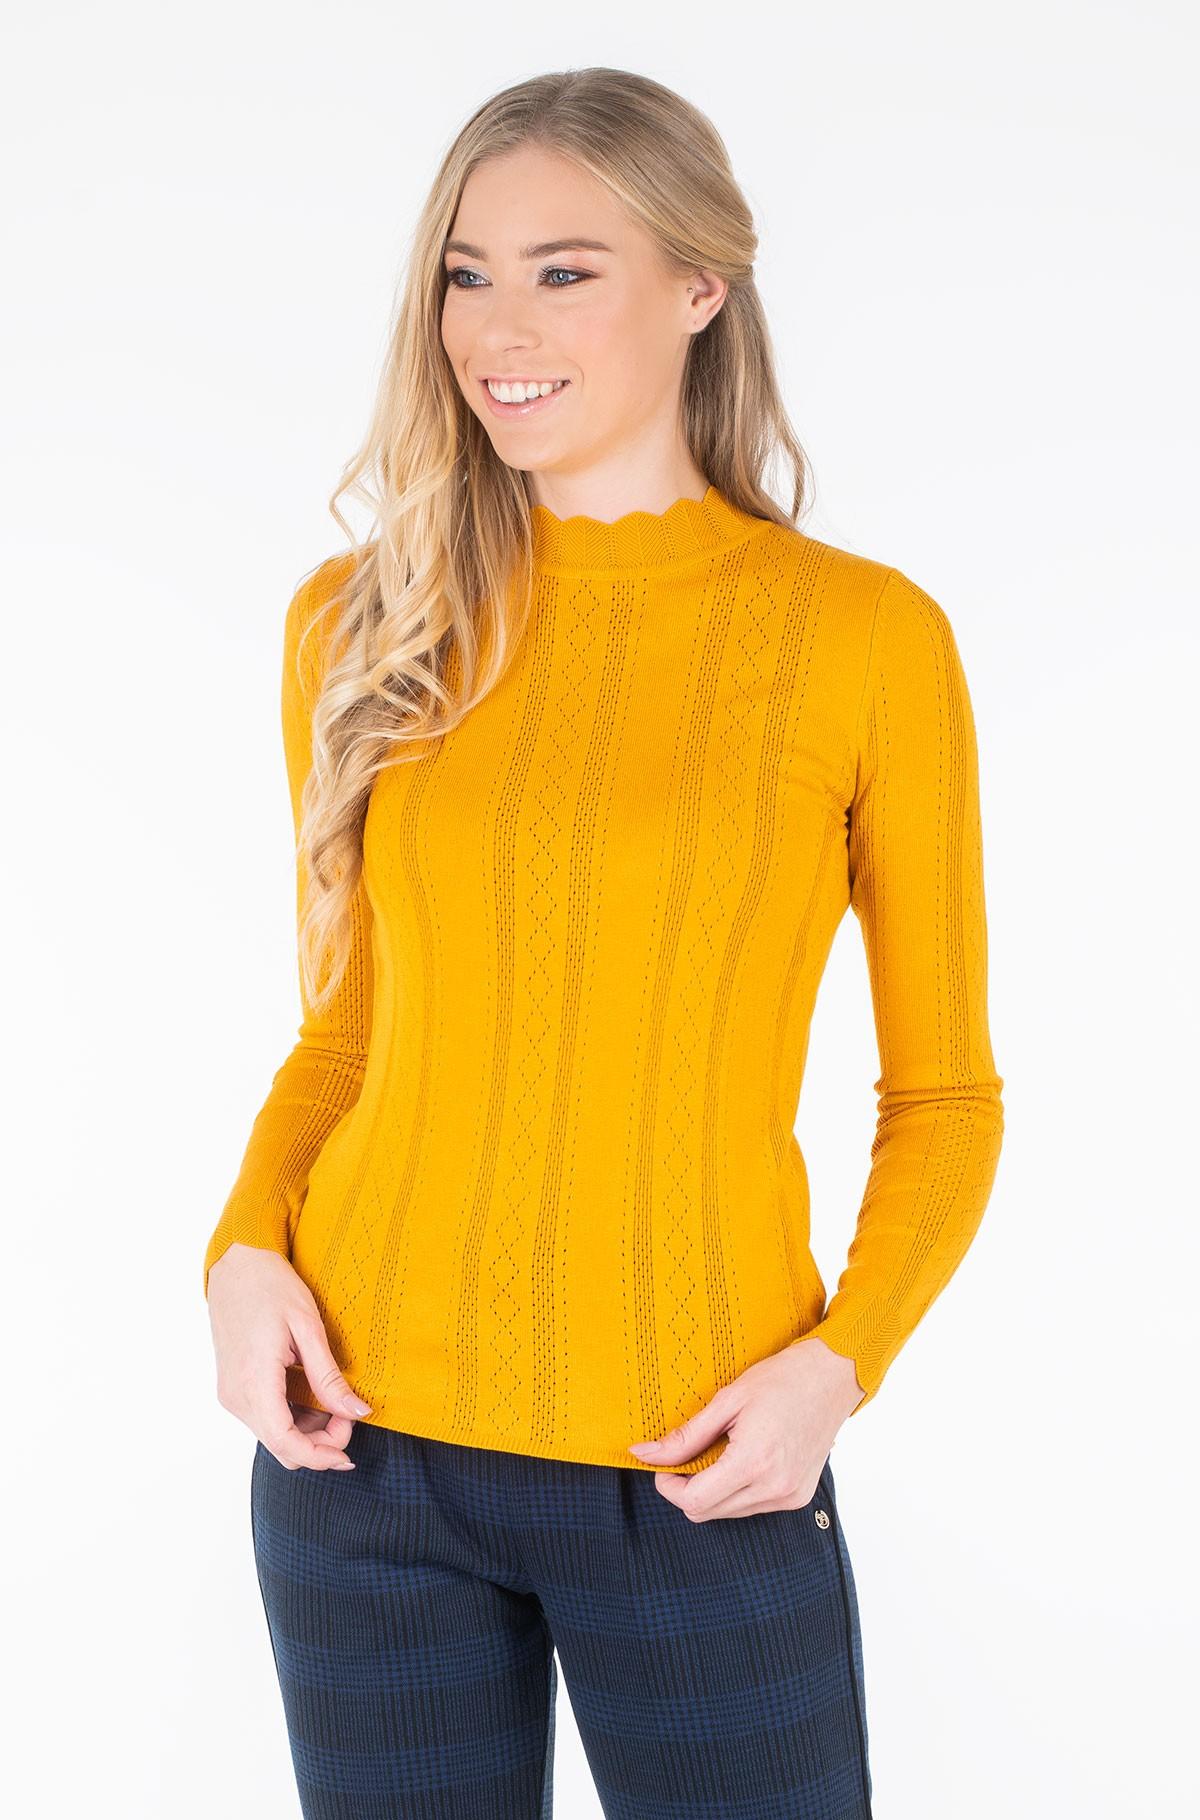 Sweater 1014348-full-1